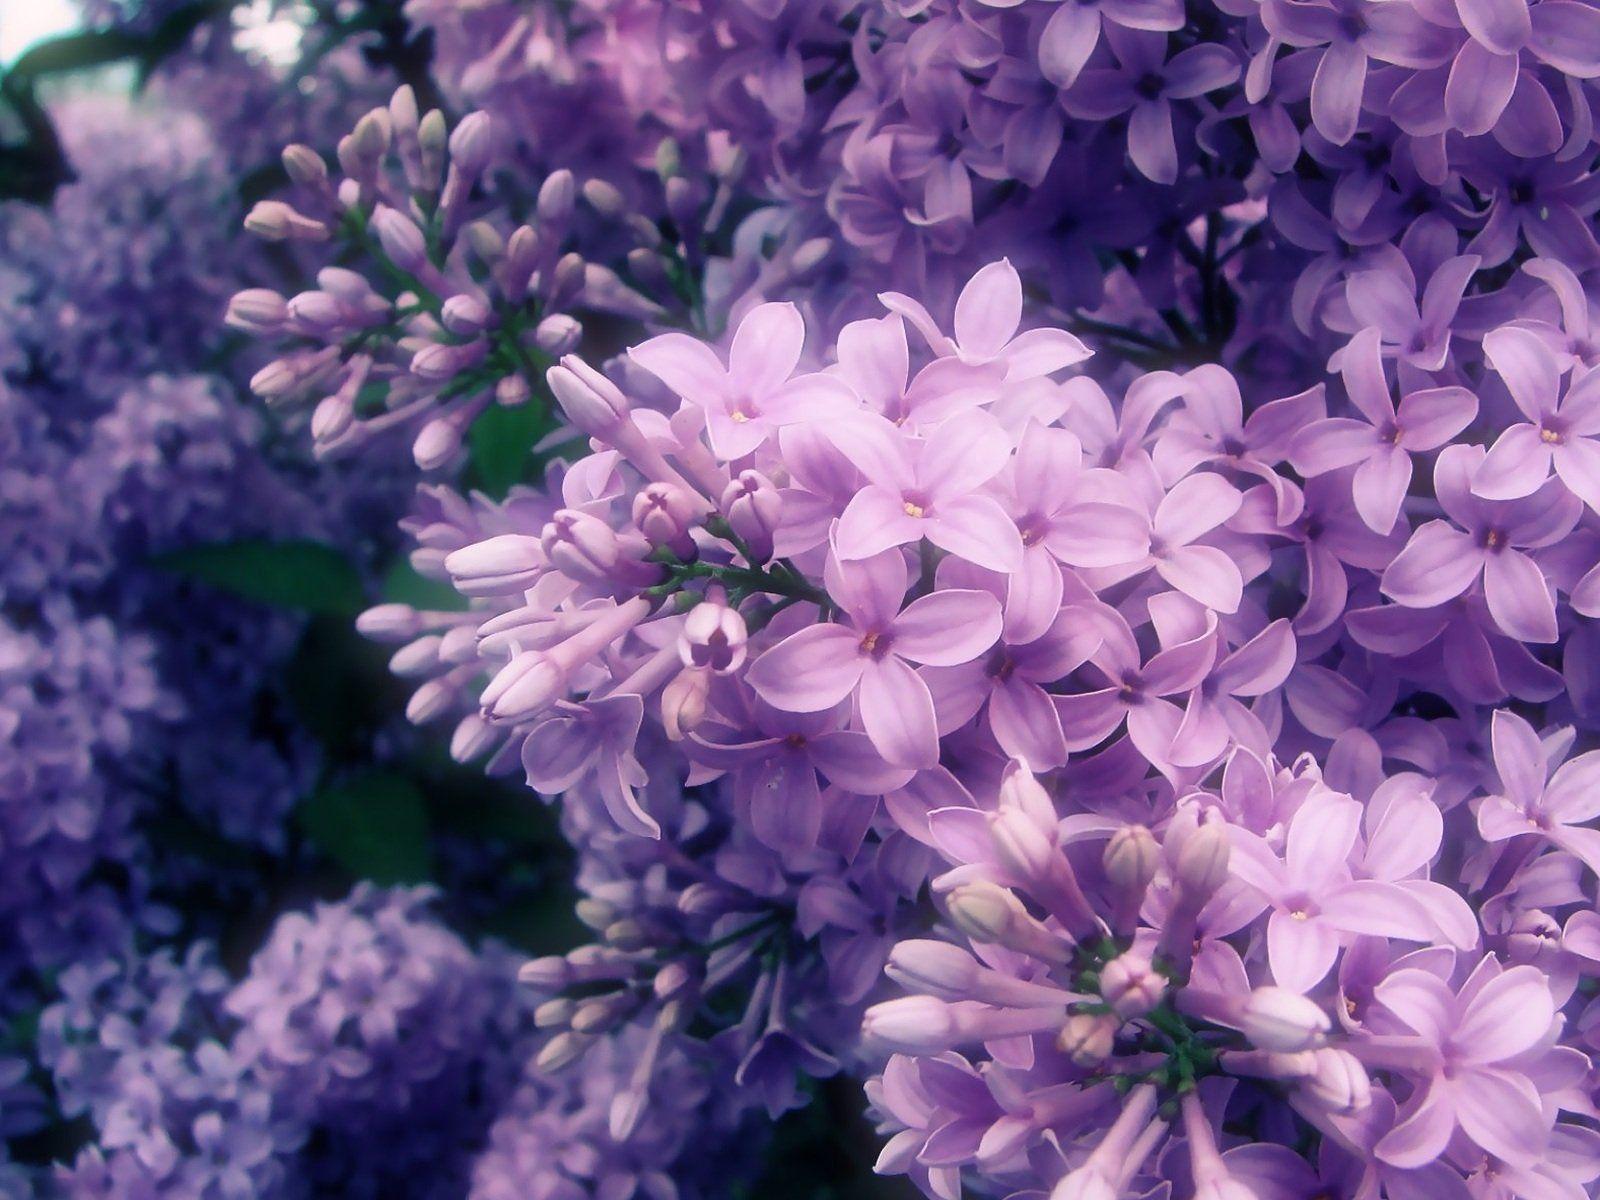 vans lilac flowers